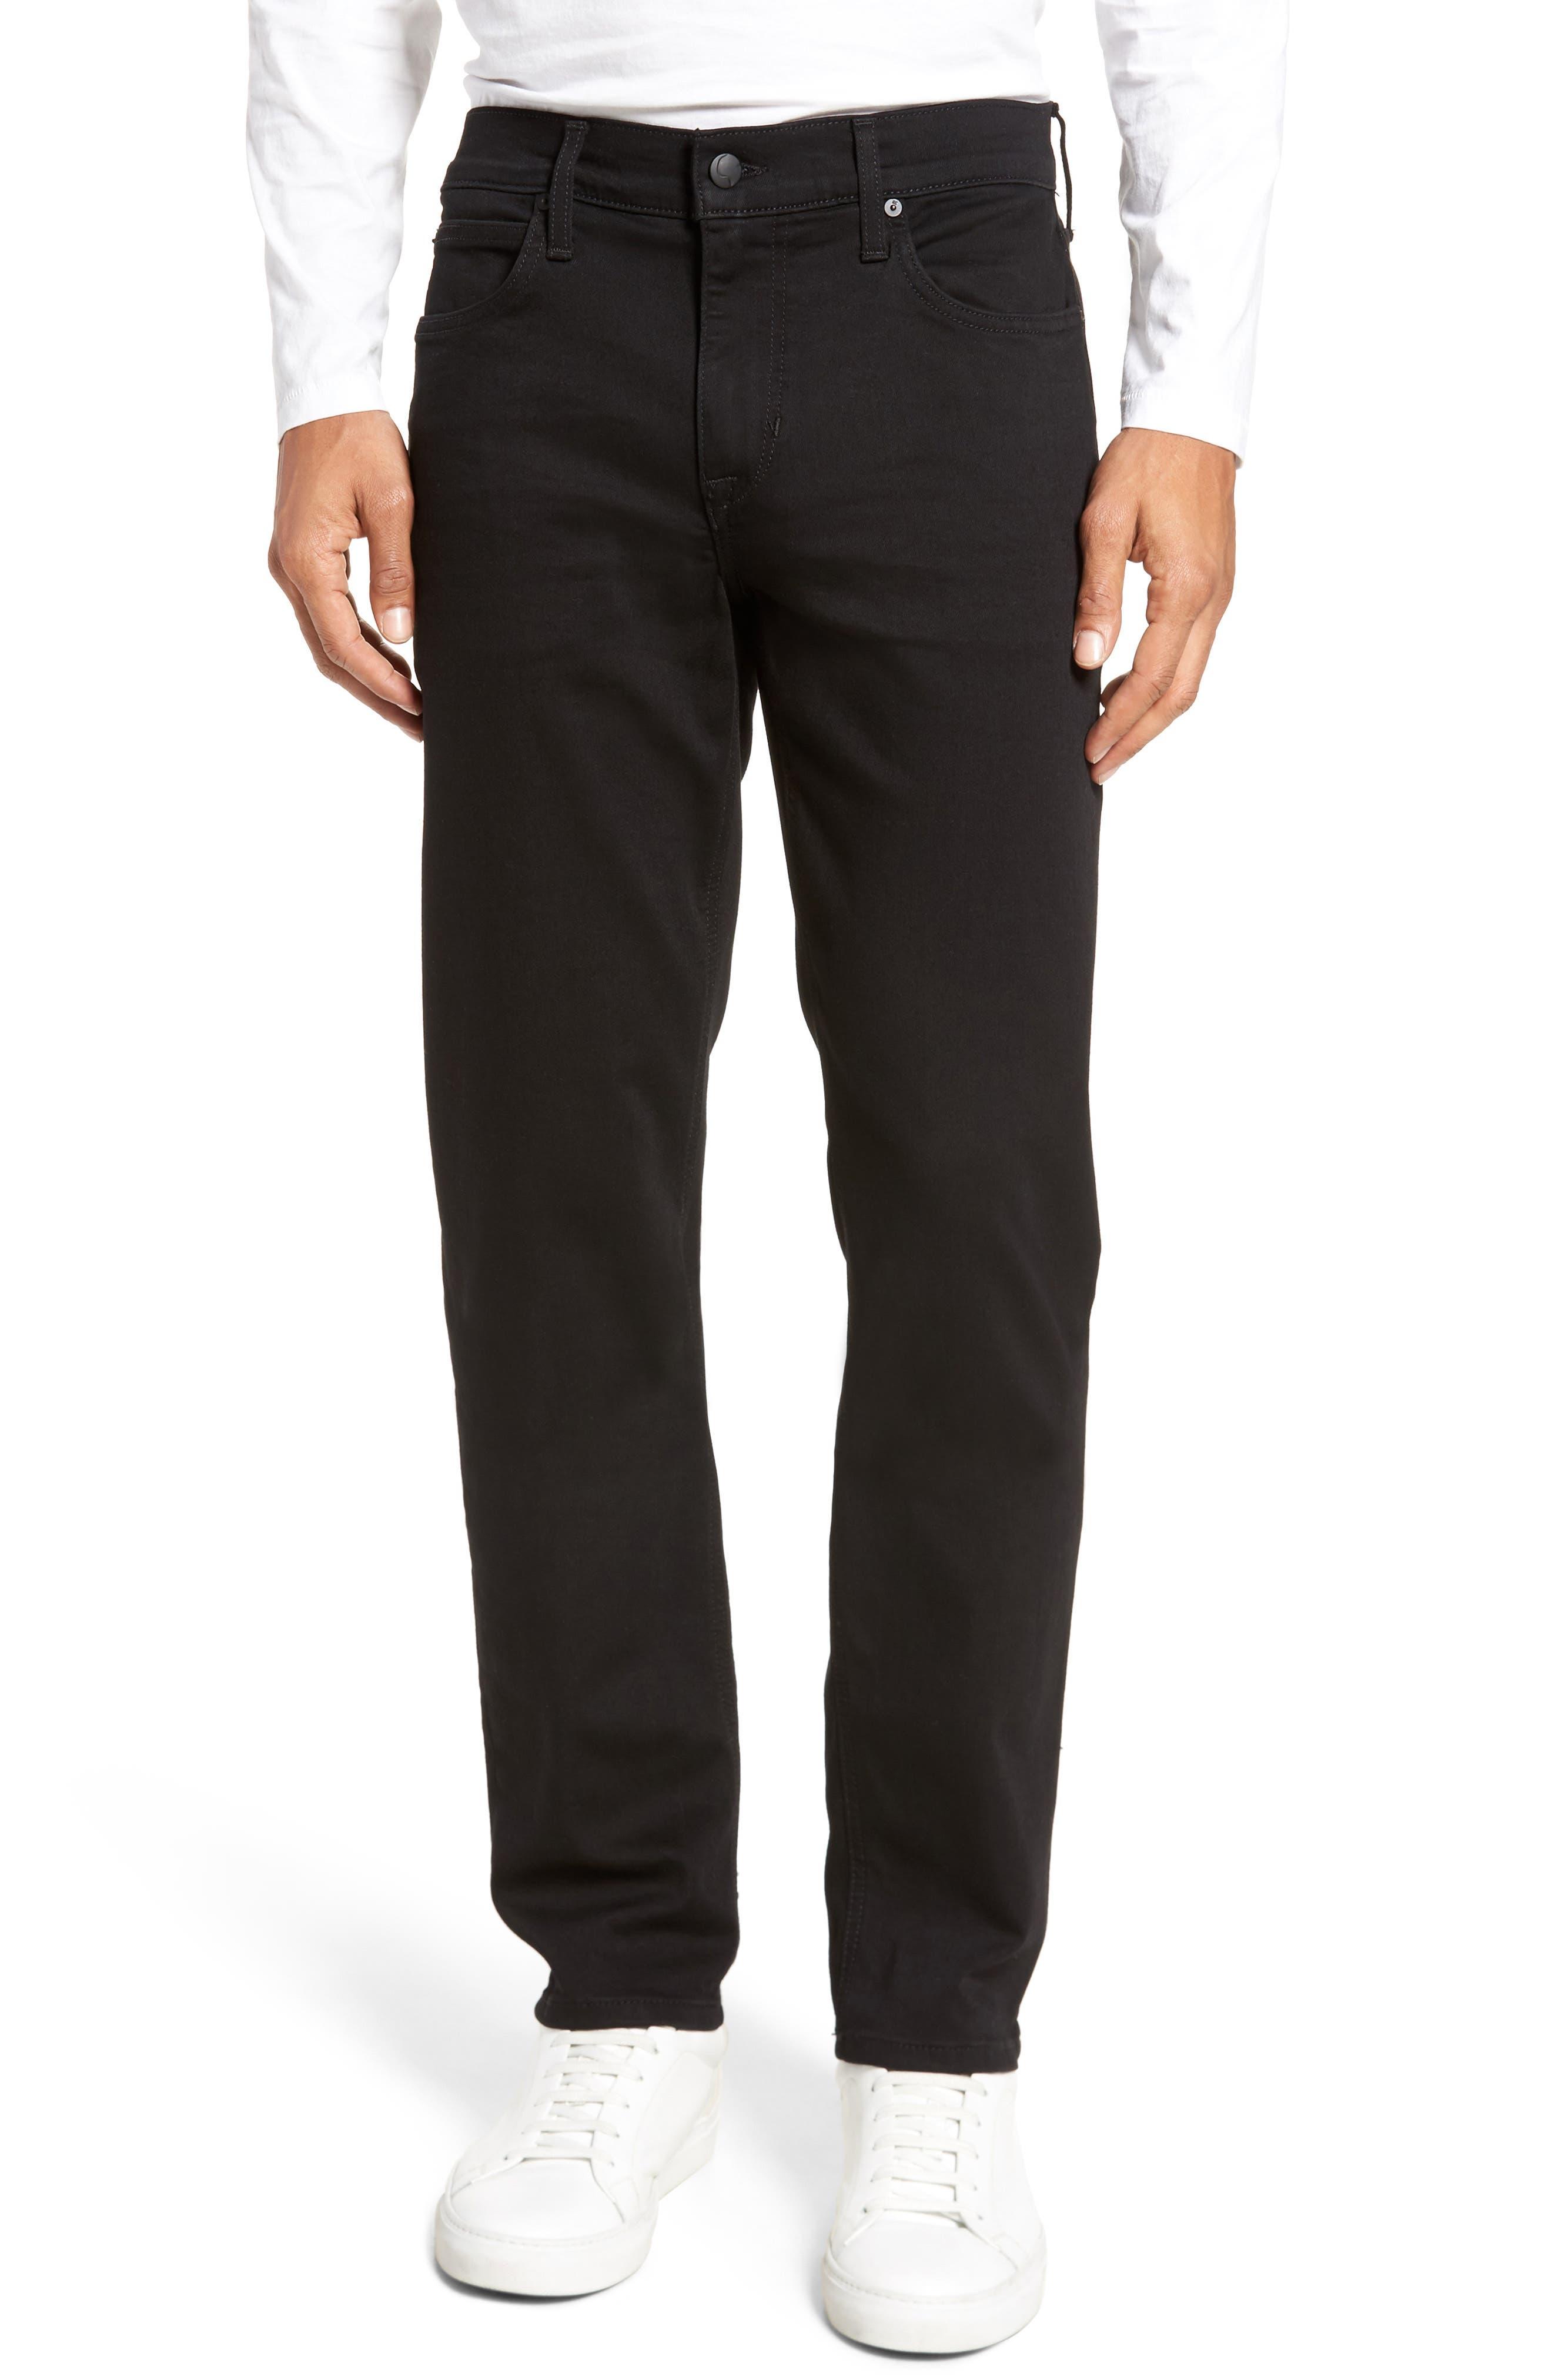 Alternate Image 1 Selected - Joe's Brixton Slim Straight Leg Jeans (Griffith)